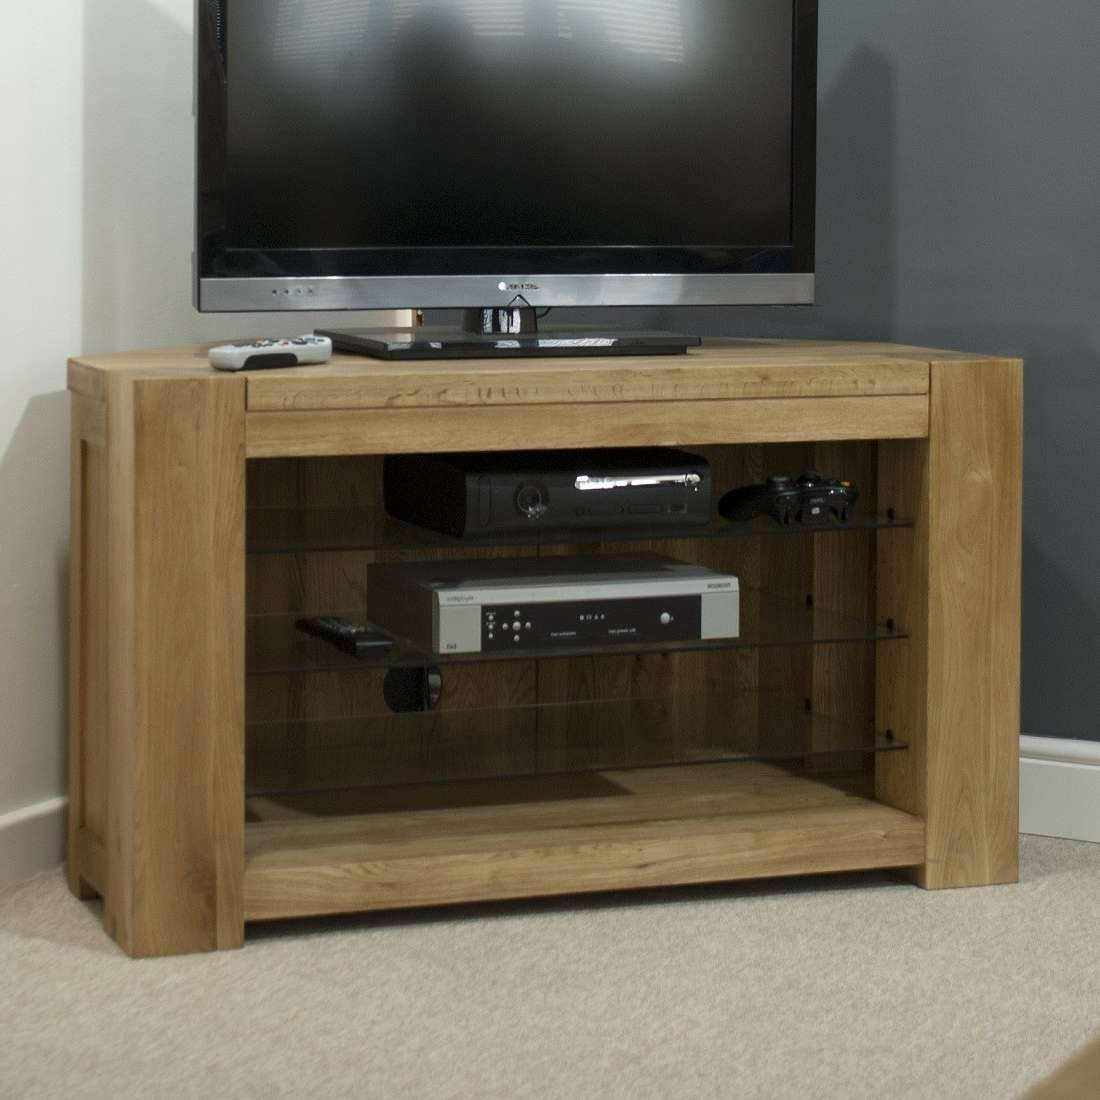 Oak Tv Units / Cabinets | Oak Furniture Uk Pertaining To Light Oak Corner Tv Cabinets (View 11 of 20)